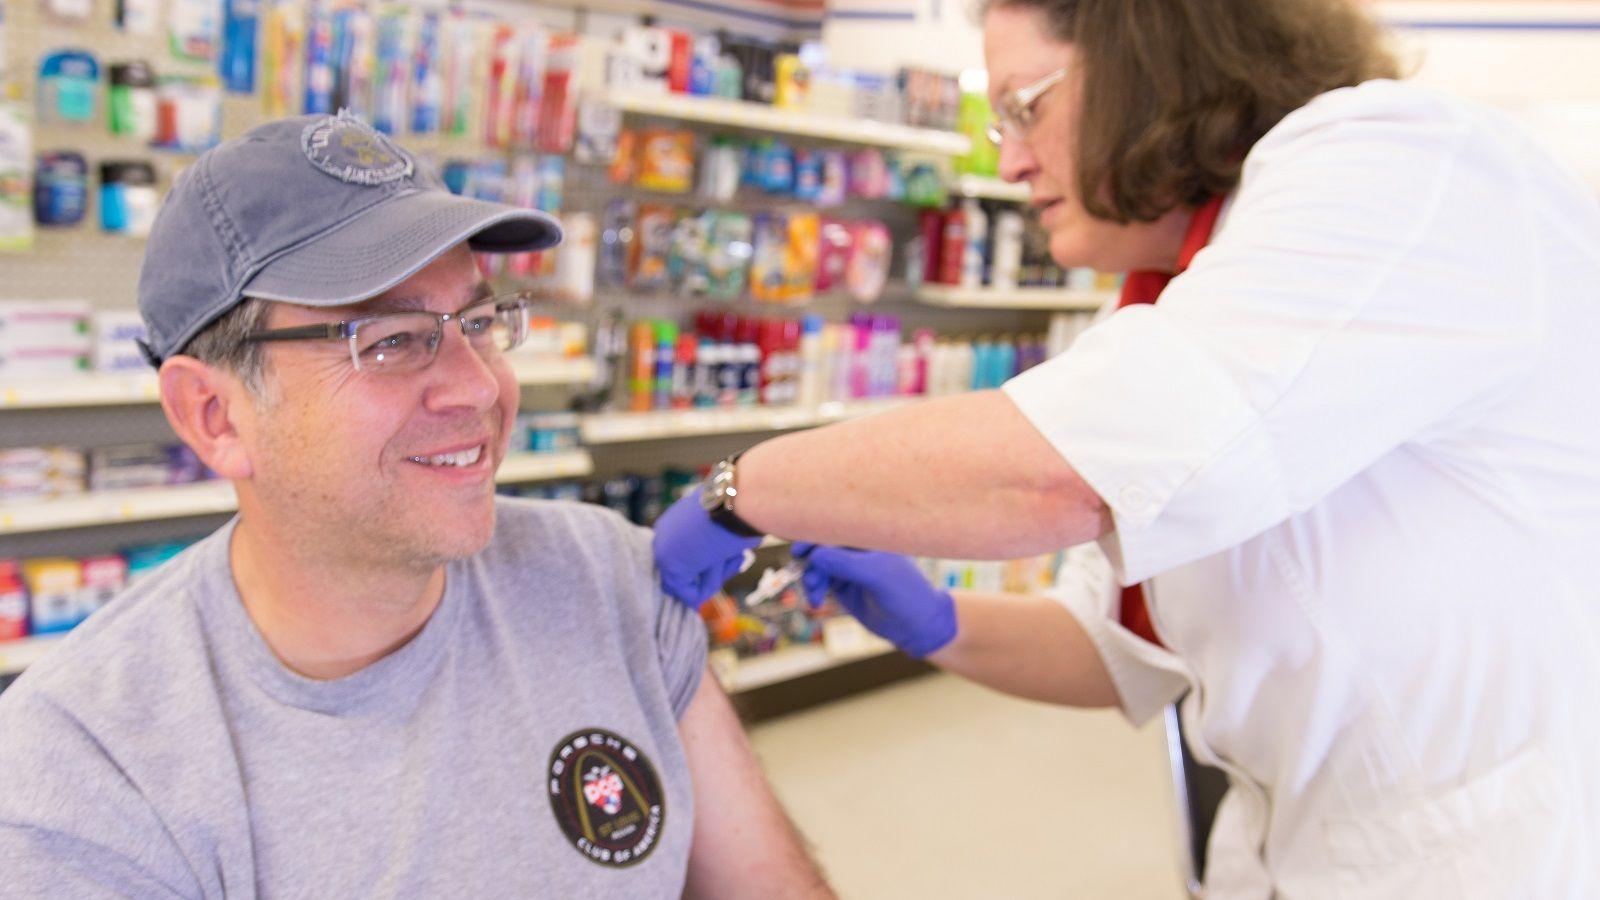 Vaccines and Immunizations